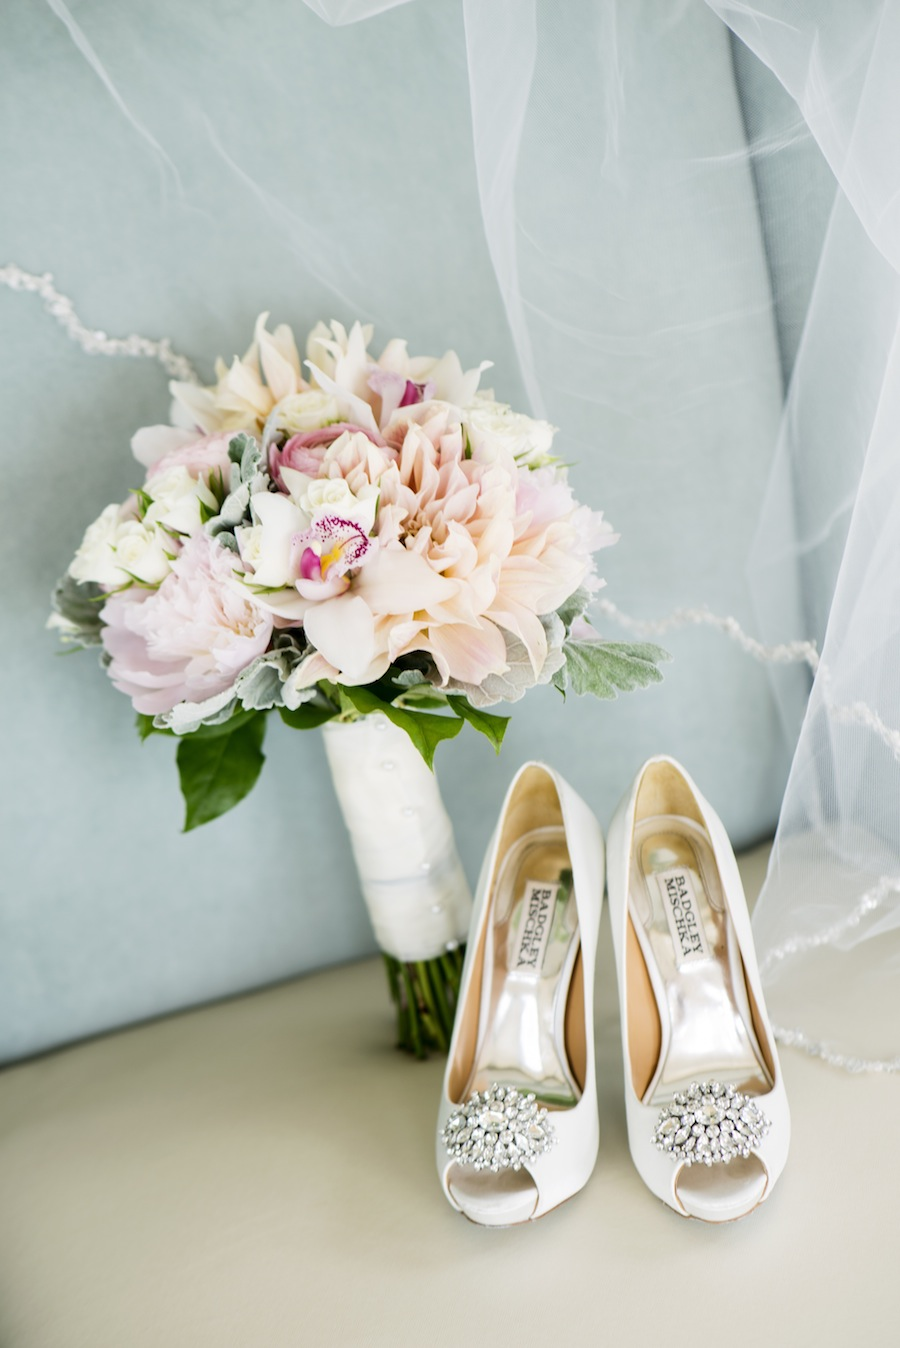 Badgley Mischika White Wedding Shoes with Rhinestones   Pastel Pink and Peach Wedding Bouquet